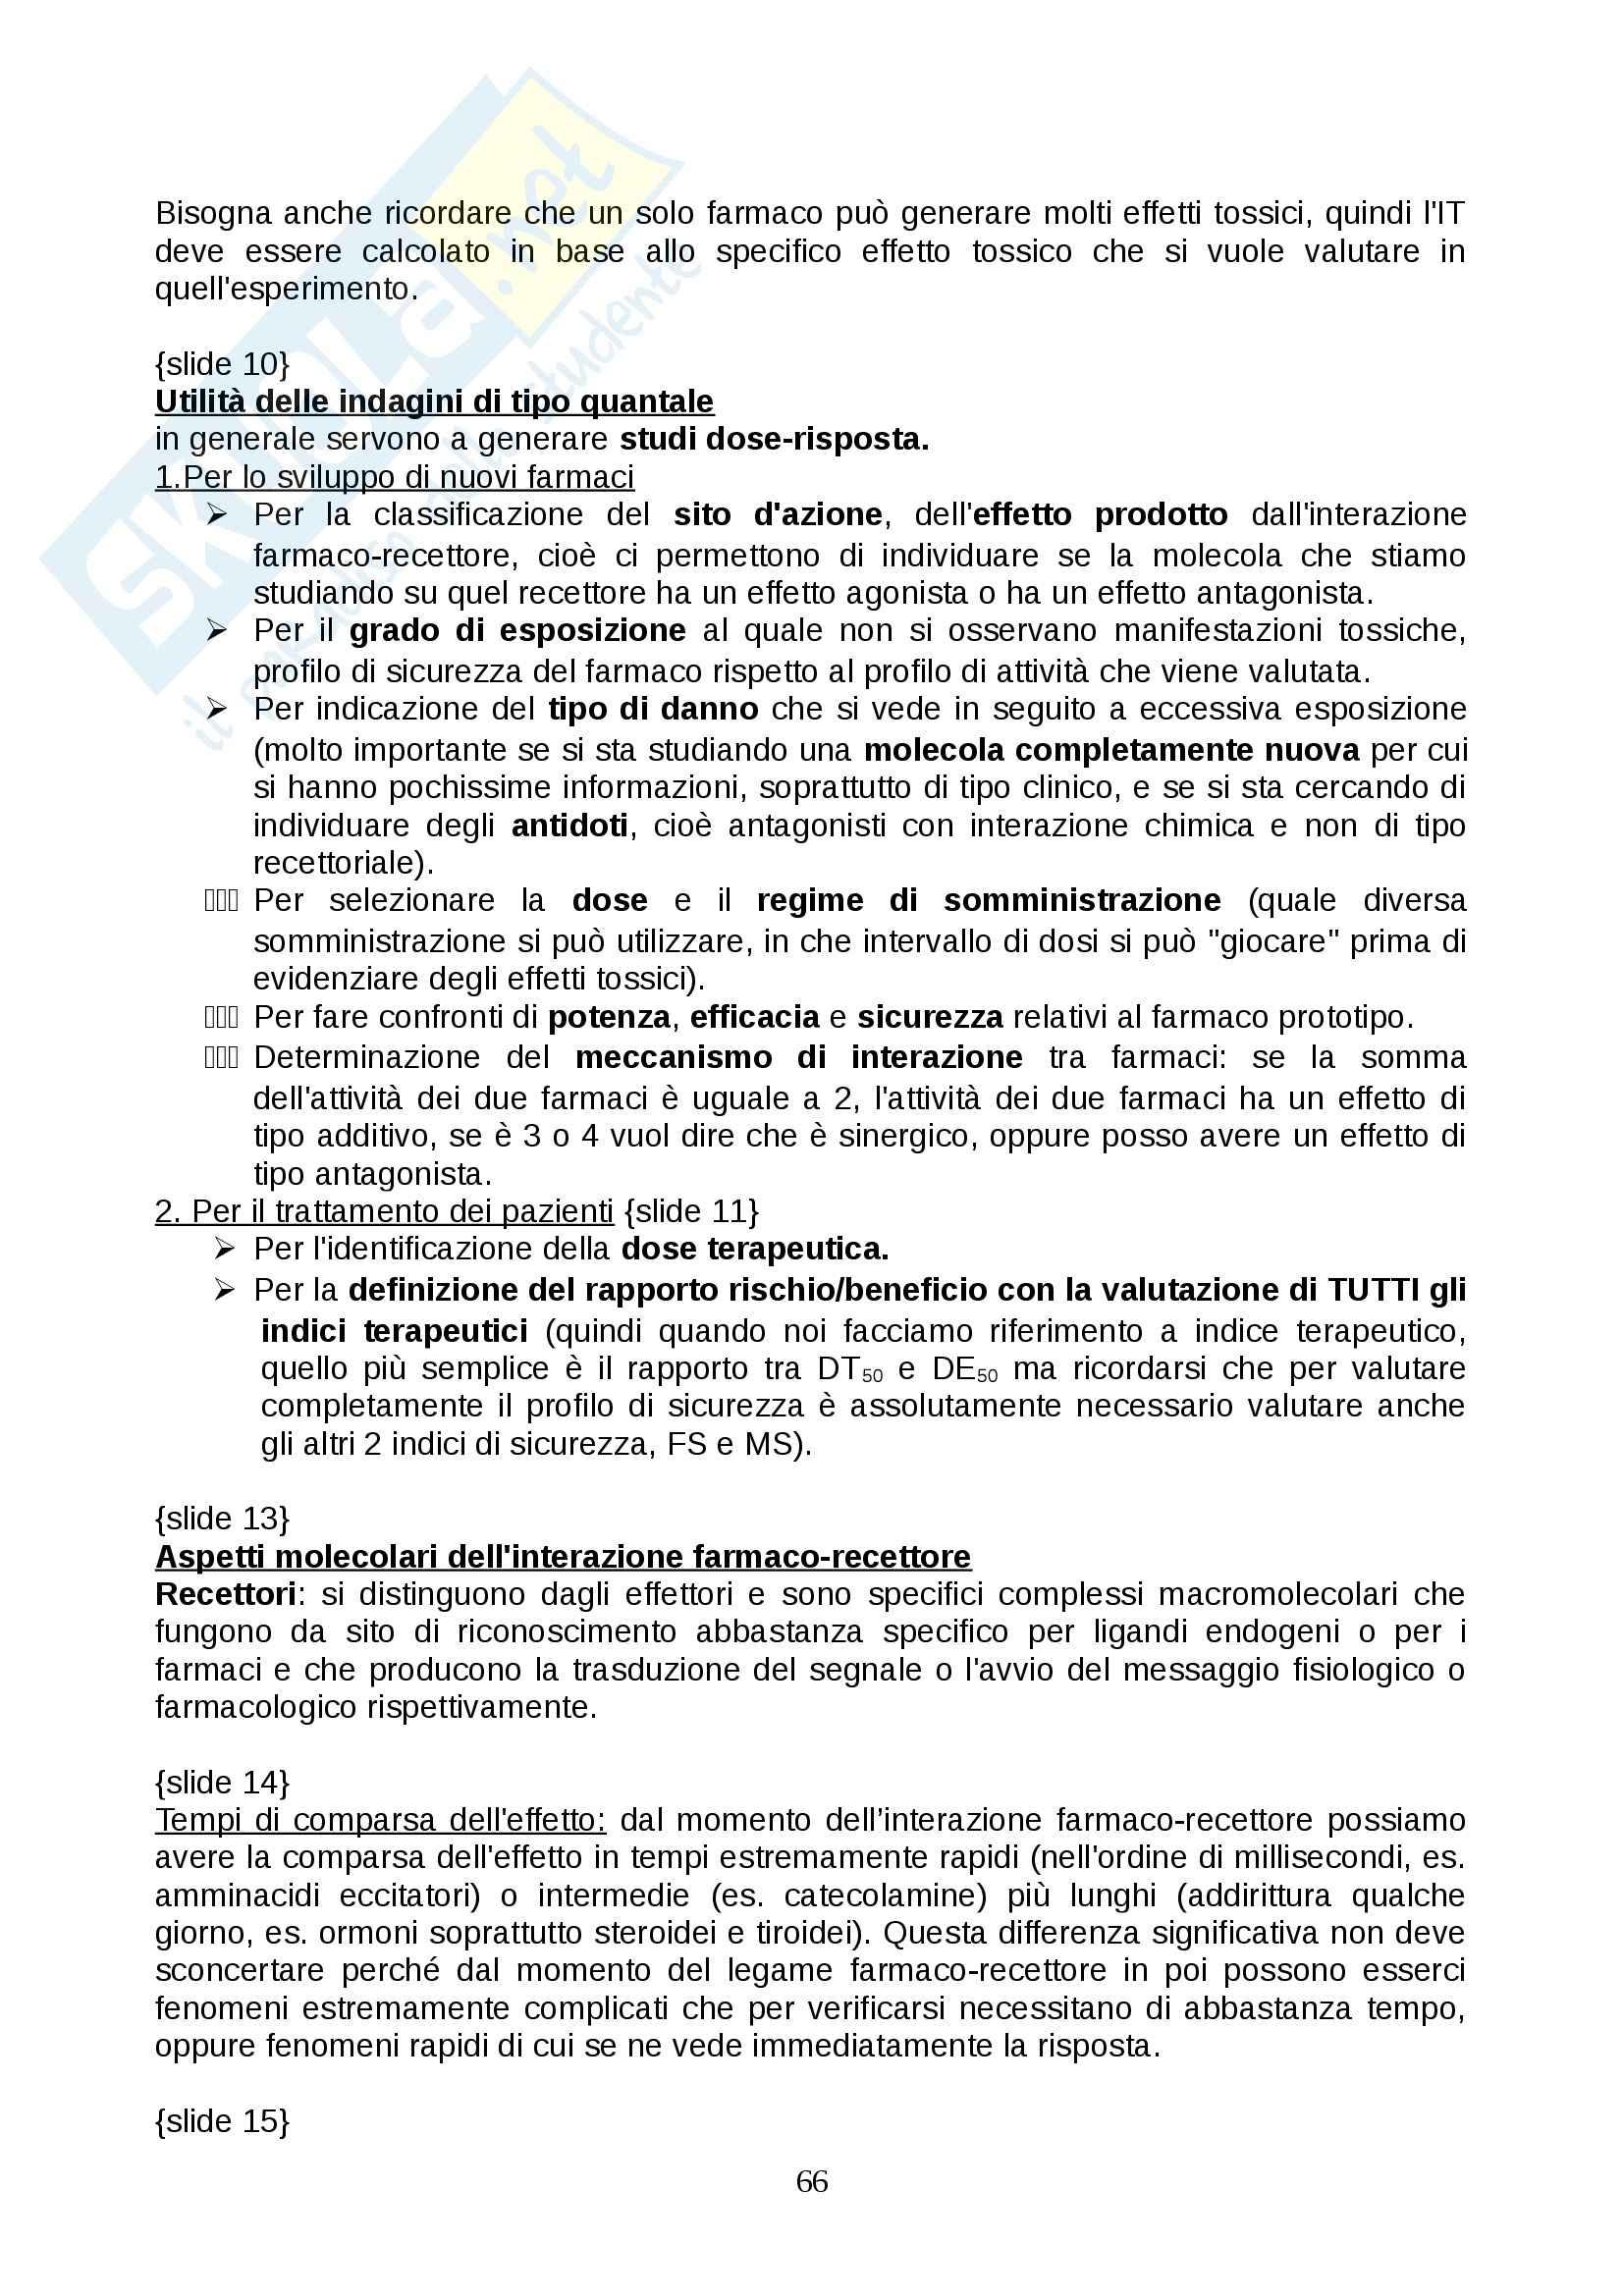 Farmacologia - farmacinetica e dinamica Pag. 66